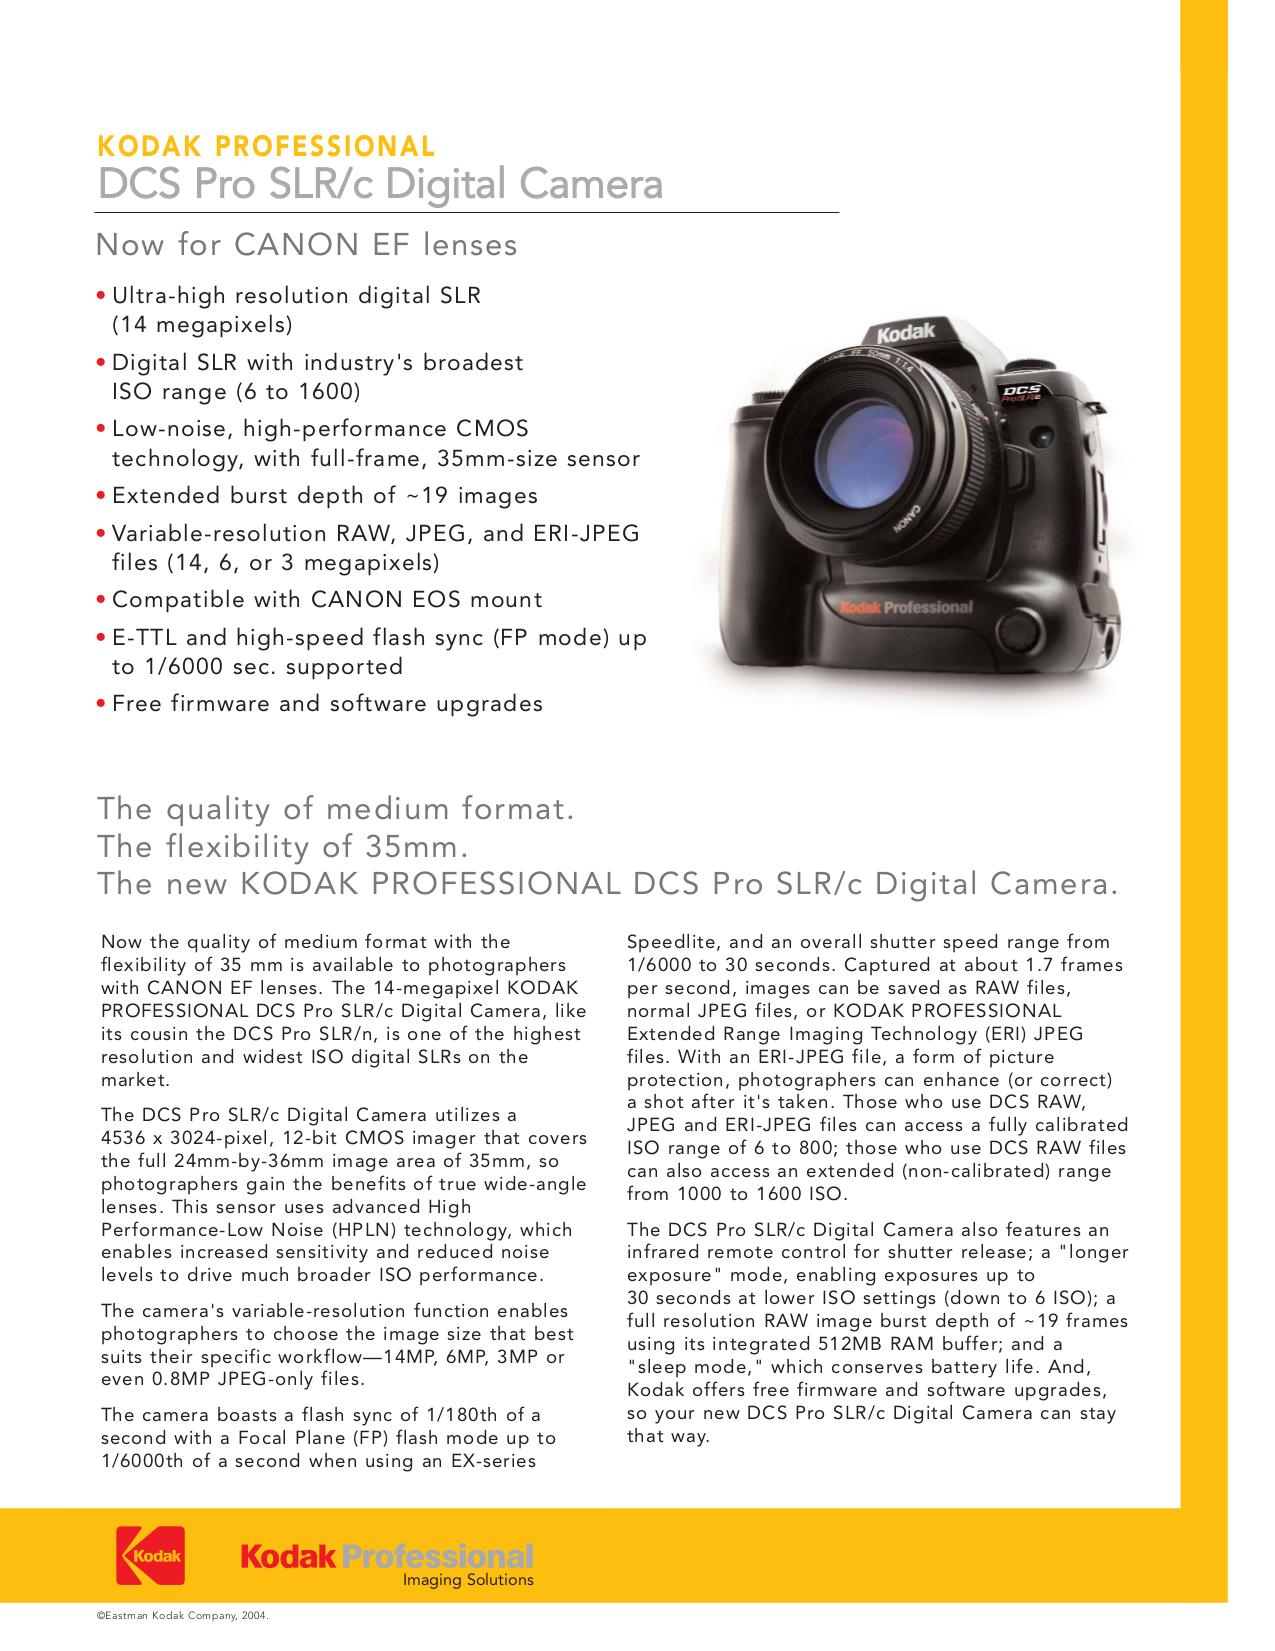 kodak digital camera industry